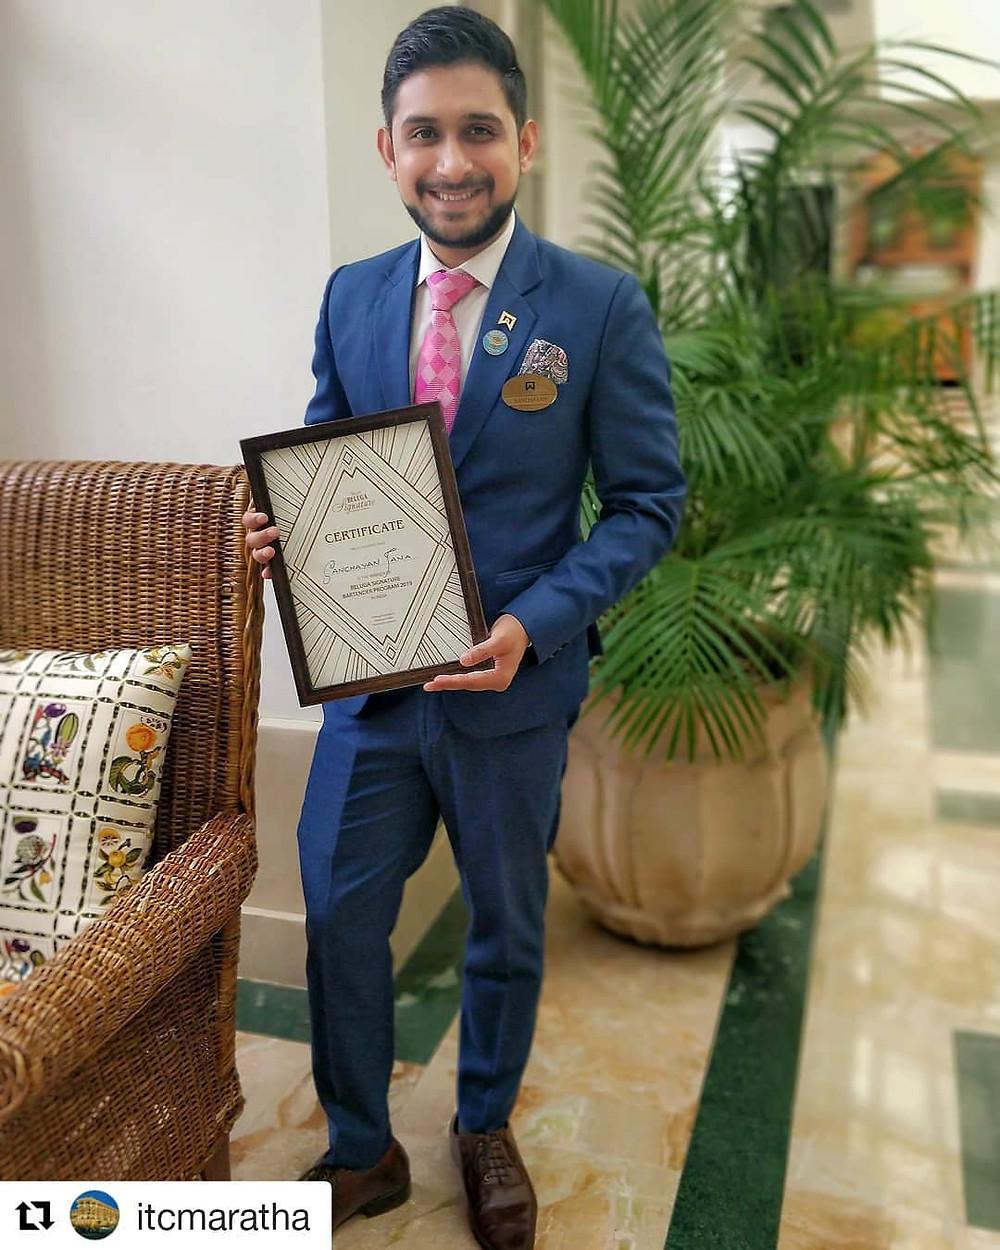 Head Mixologist at @itcmaratha Beluga Signature 2019; India Champion 🥇 Bacardi Legacy 2018; National Finalist; Glenfiddich Experimental Bartender 2018